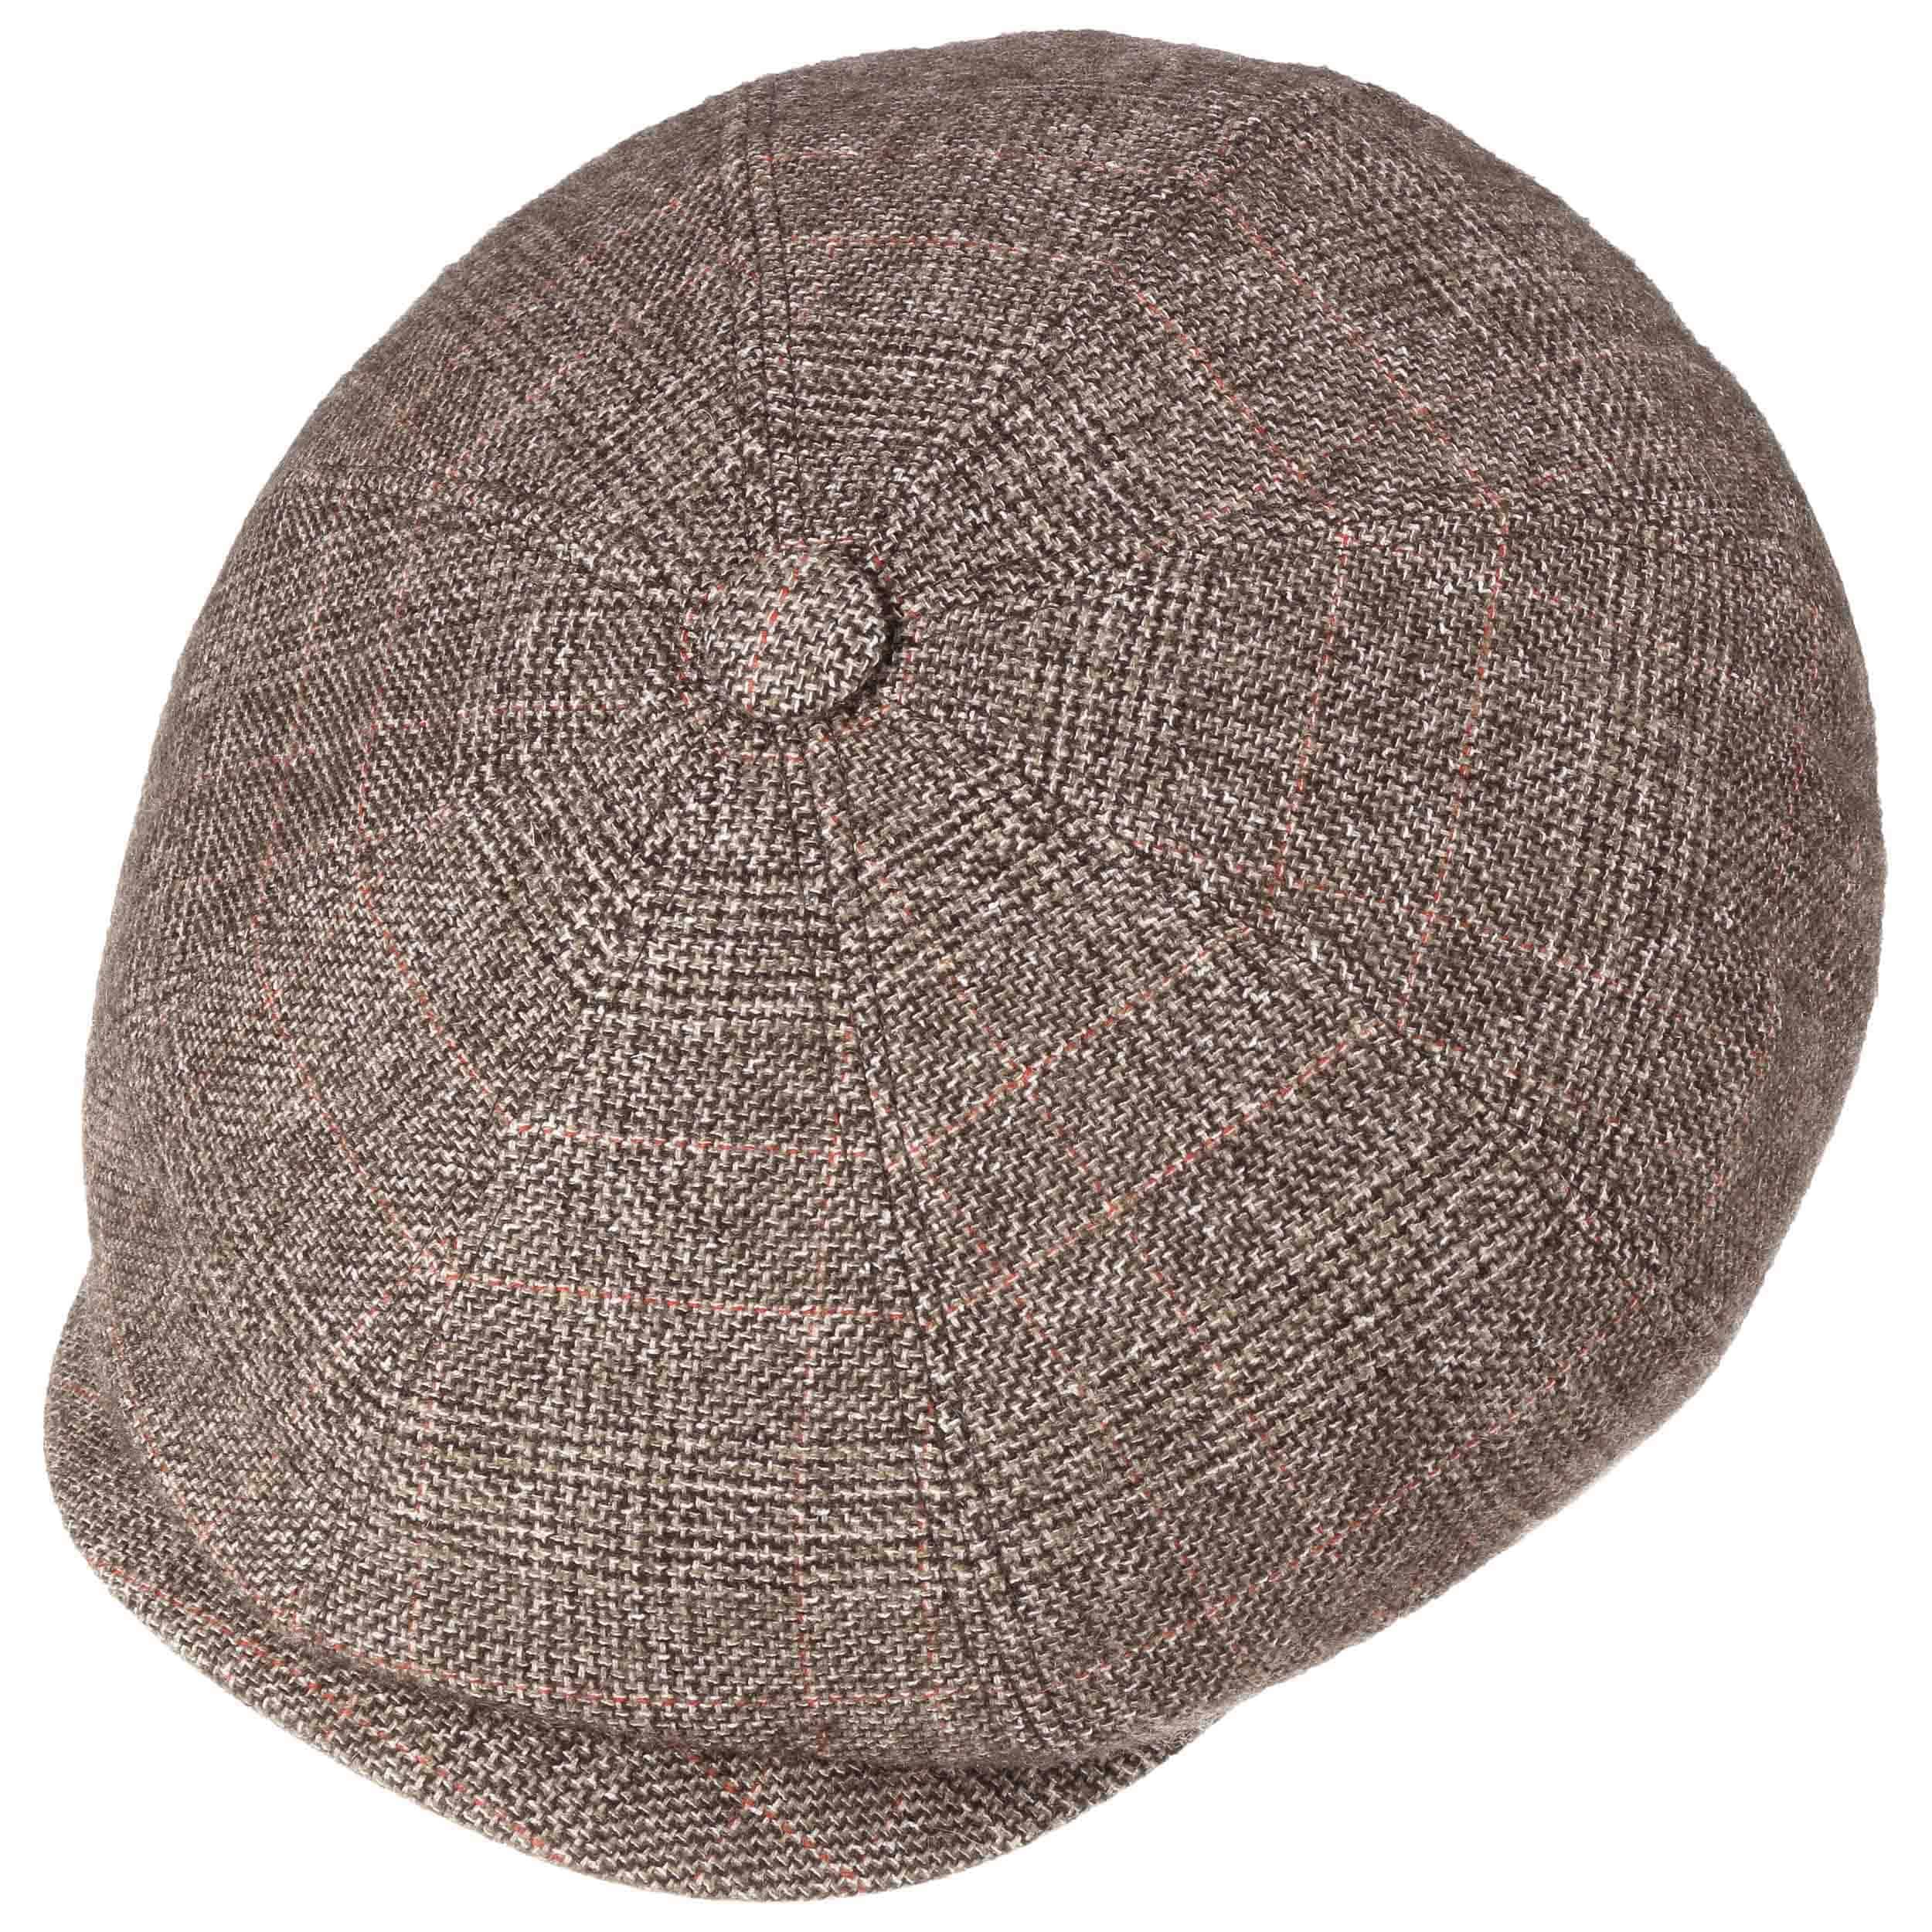 Gorra Hatteras Cachemira y Seda by Stetson - Gorras - sombreroshop.es 8e6b82f959c